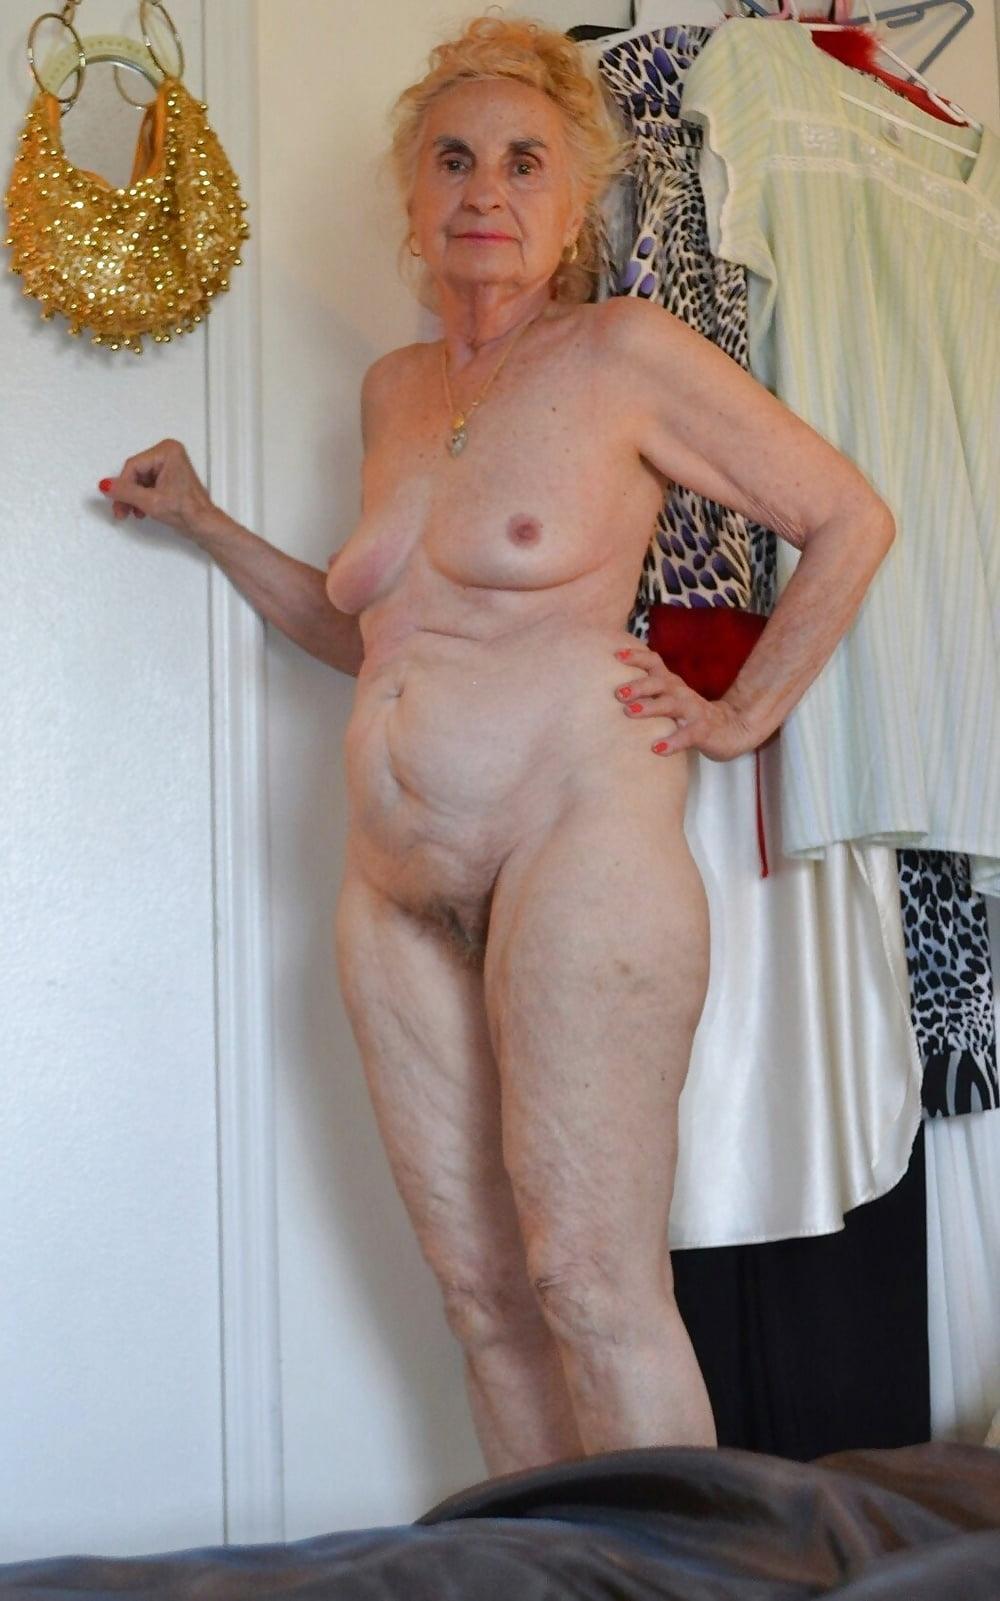 Granny chav nude pic, rockabilly girls in lingerie